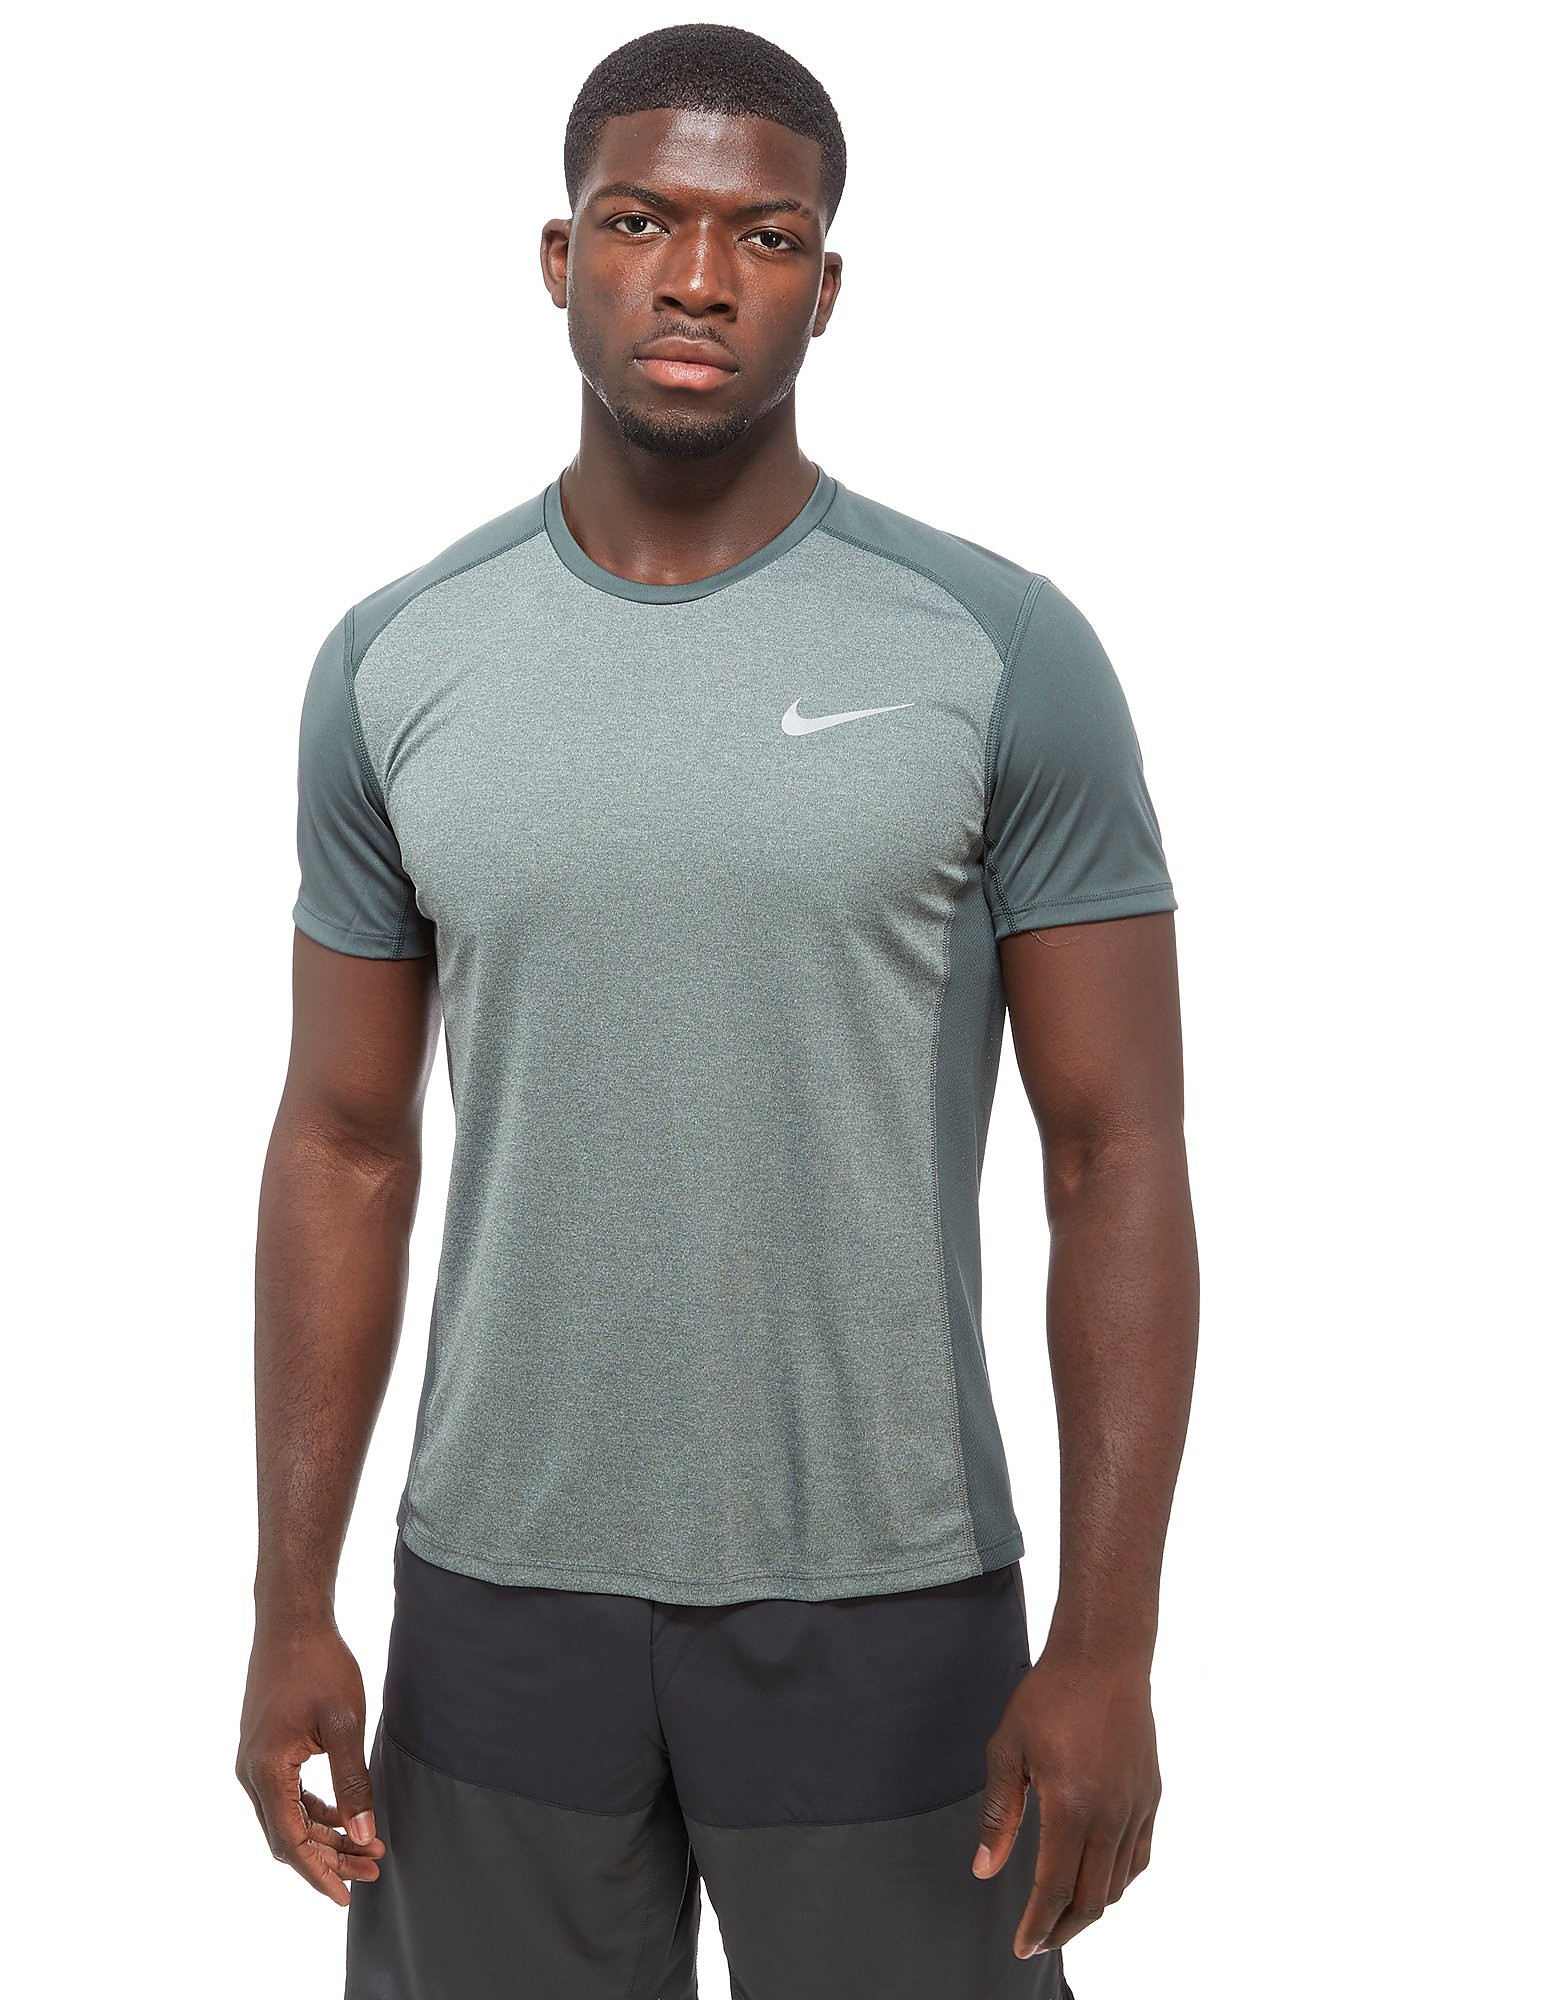 Nike camiseta Dry Miler